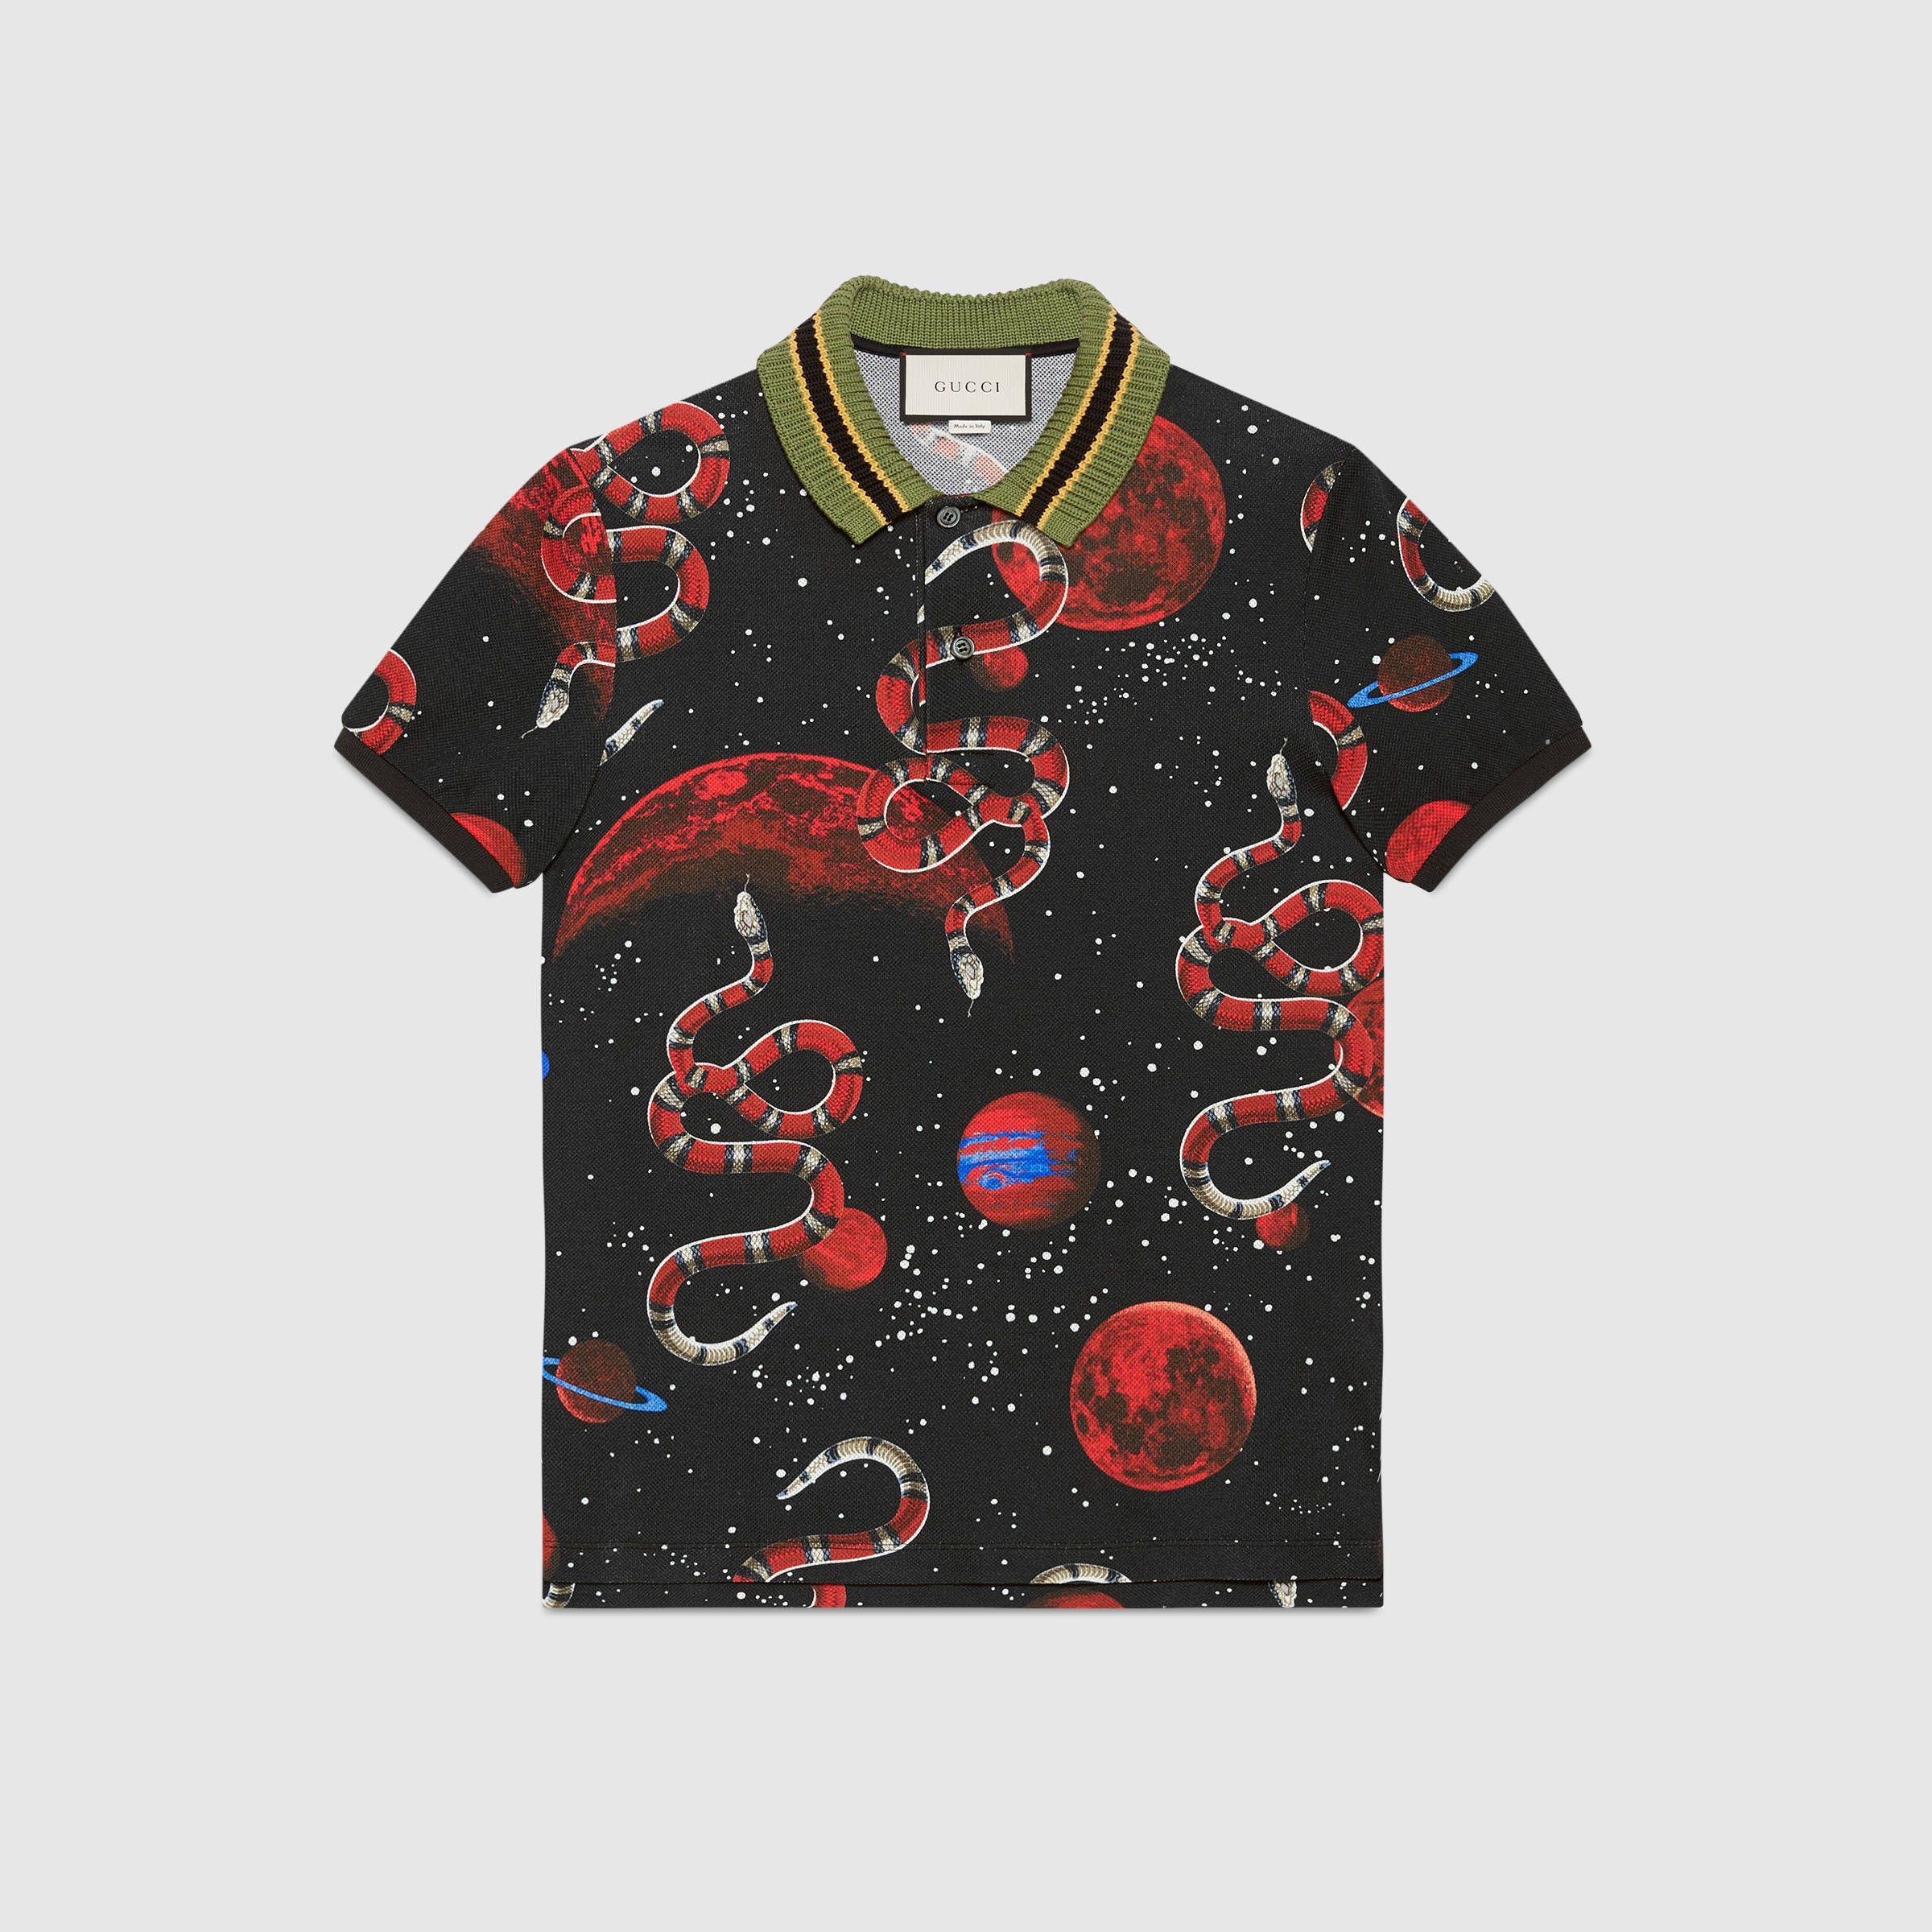 Gucci Men - Men's T-shirts & Polos - Men's Polos